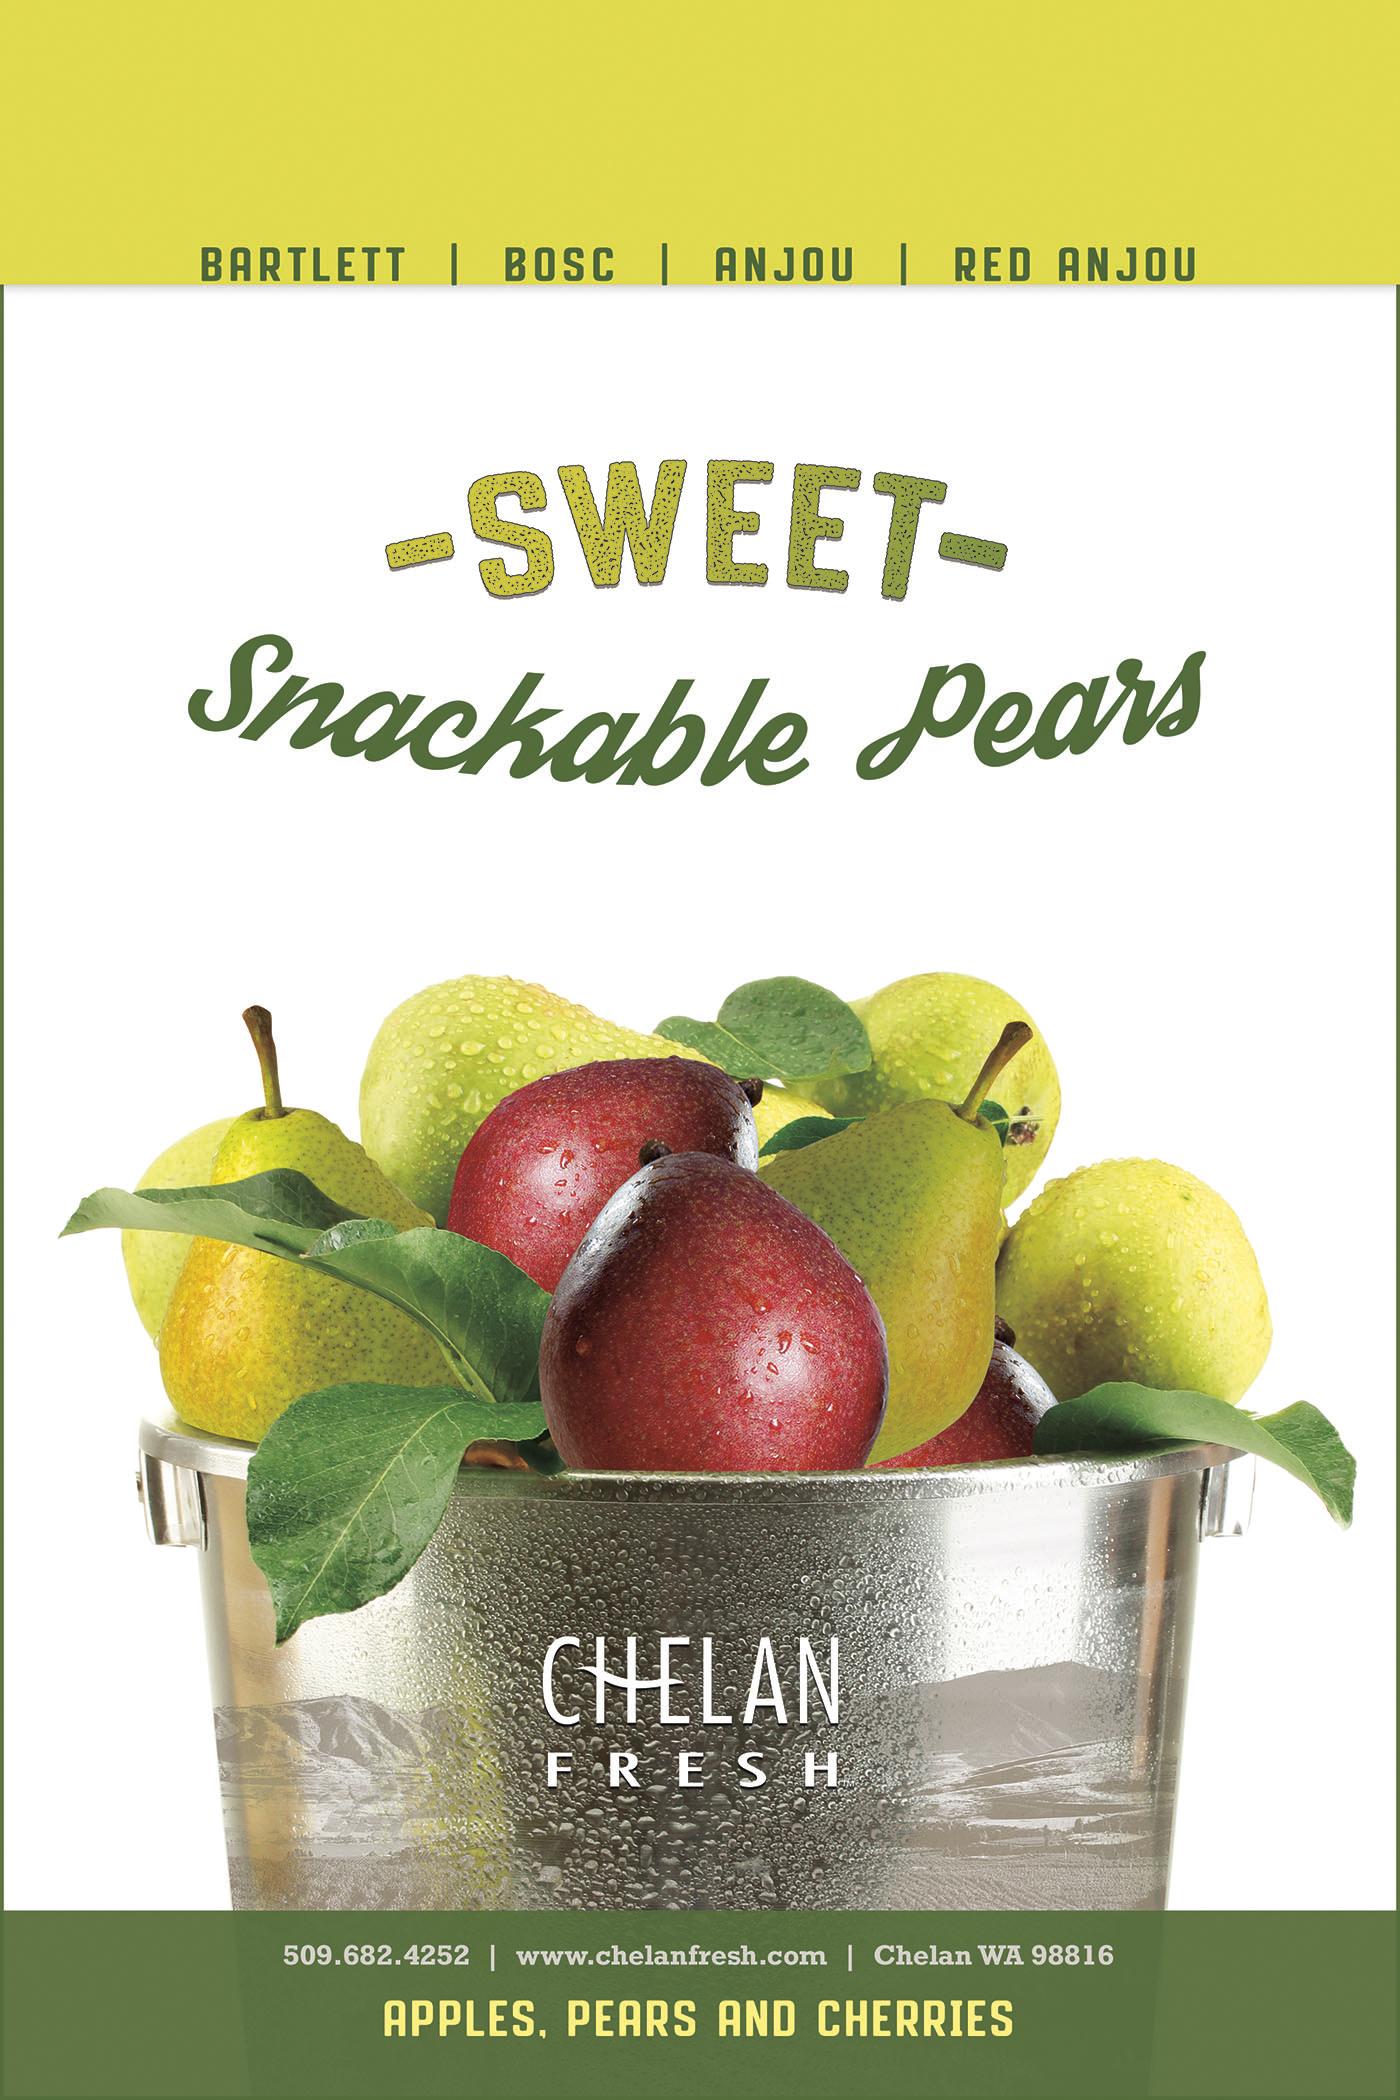 Chelan Fresh Pears.jpg